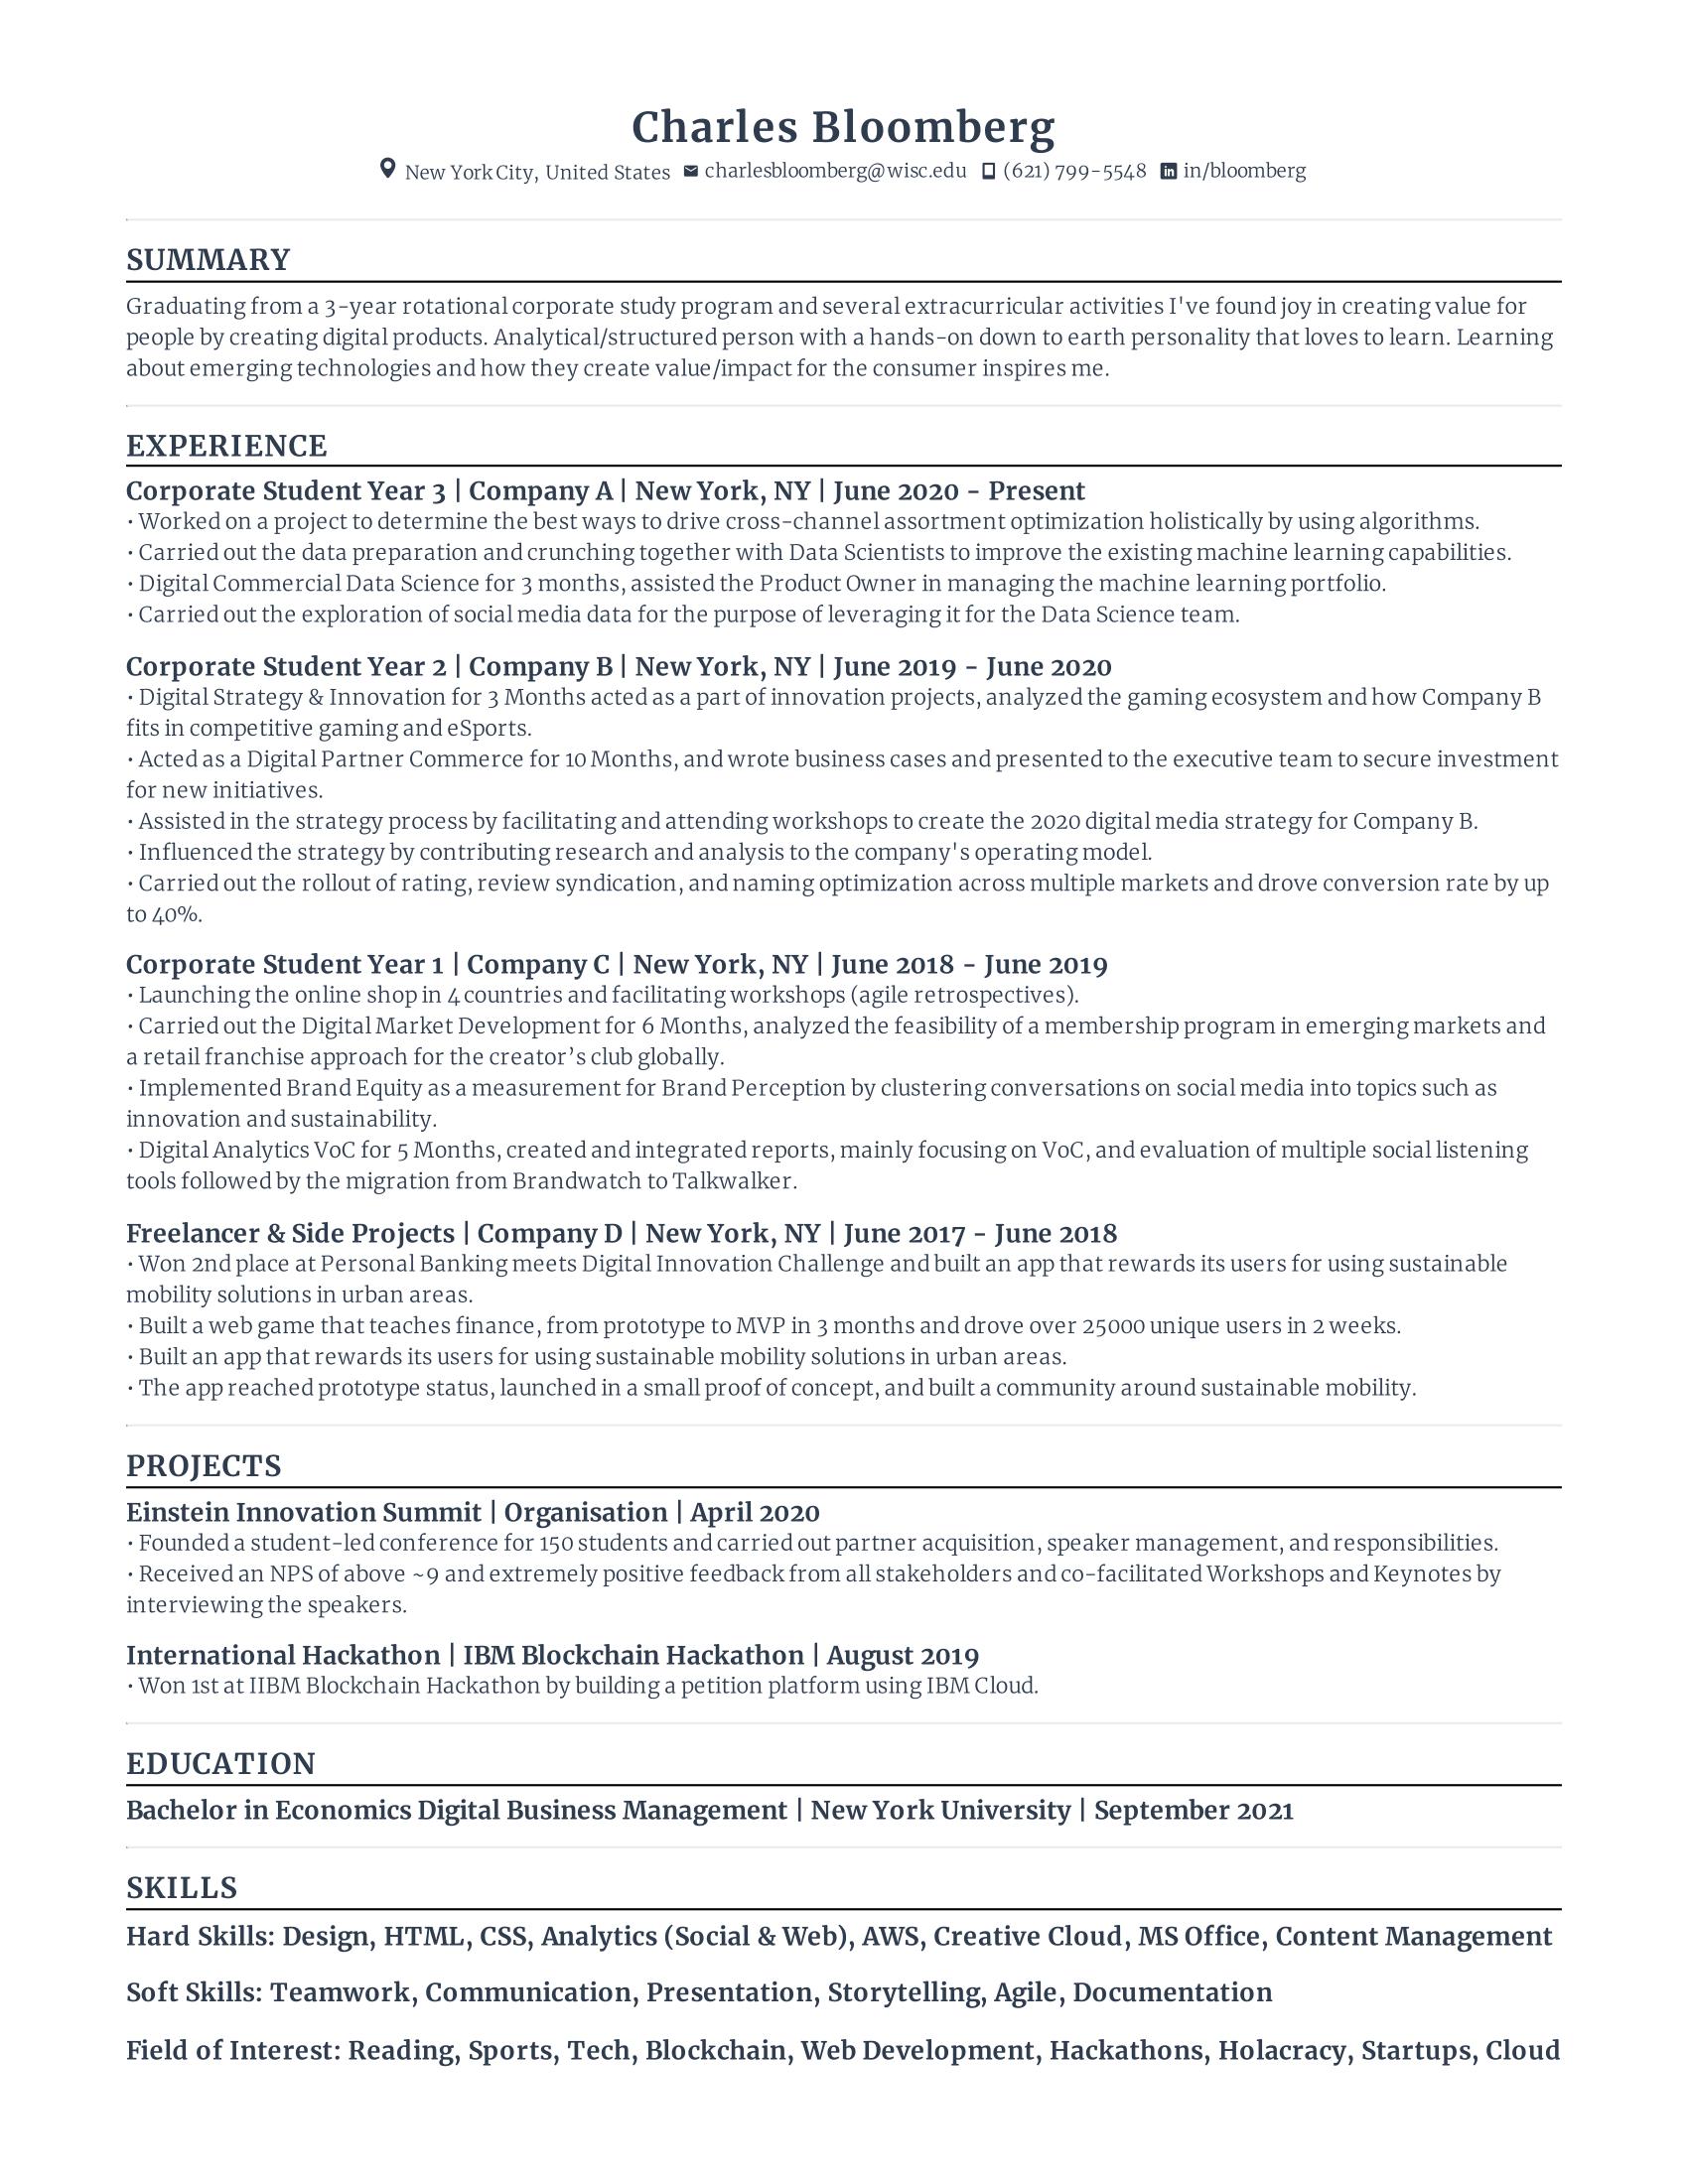 Corporate Rotational Graduate Resume